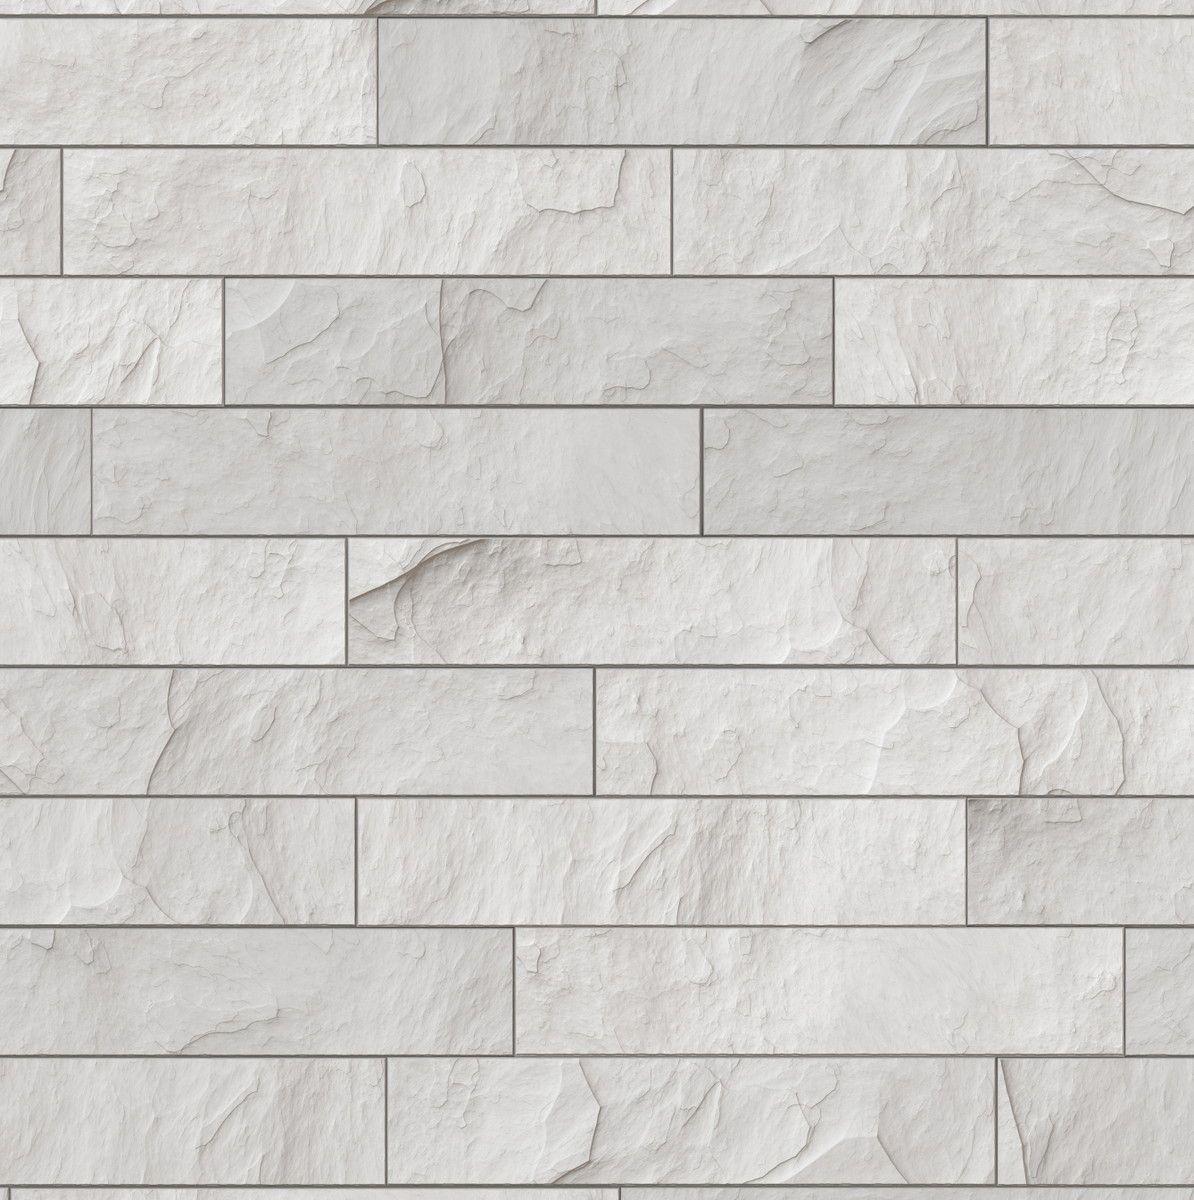 Papel de Parede Tijolinhos Branco 6CCA48